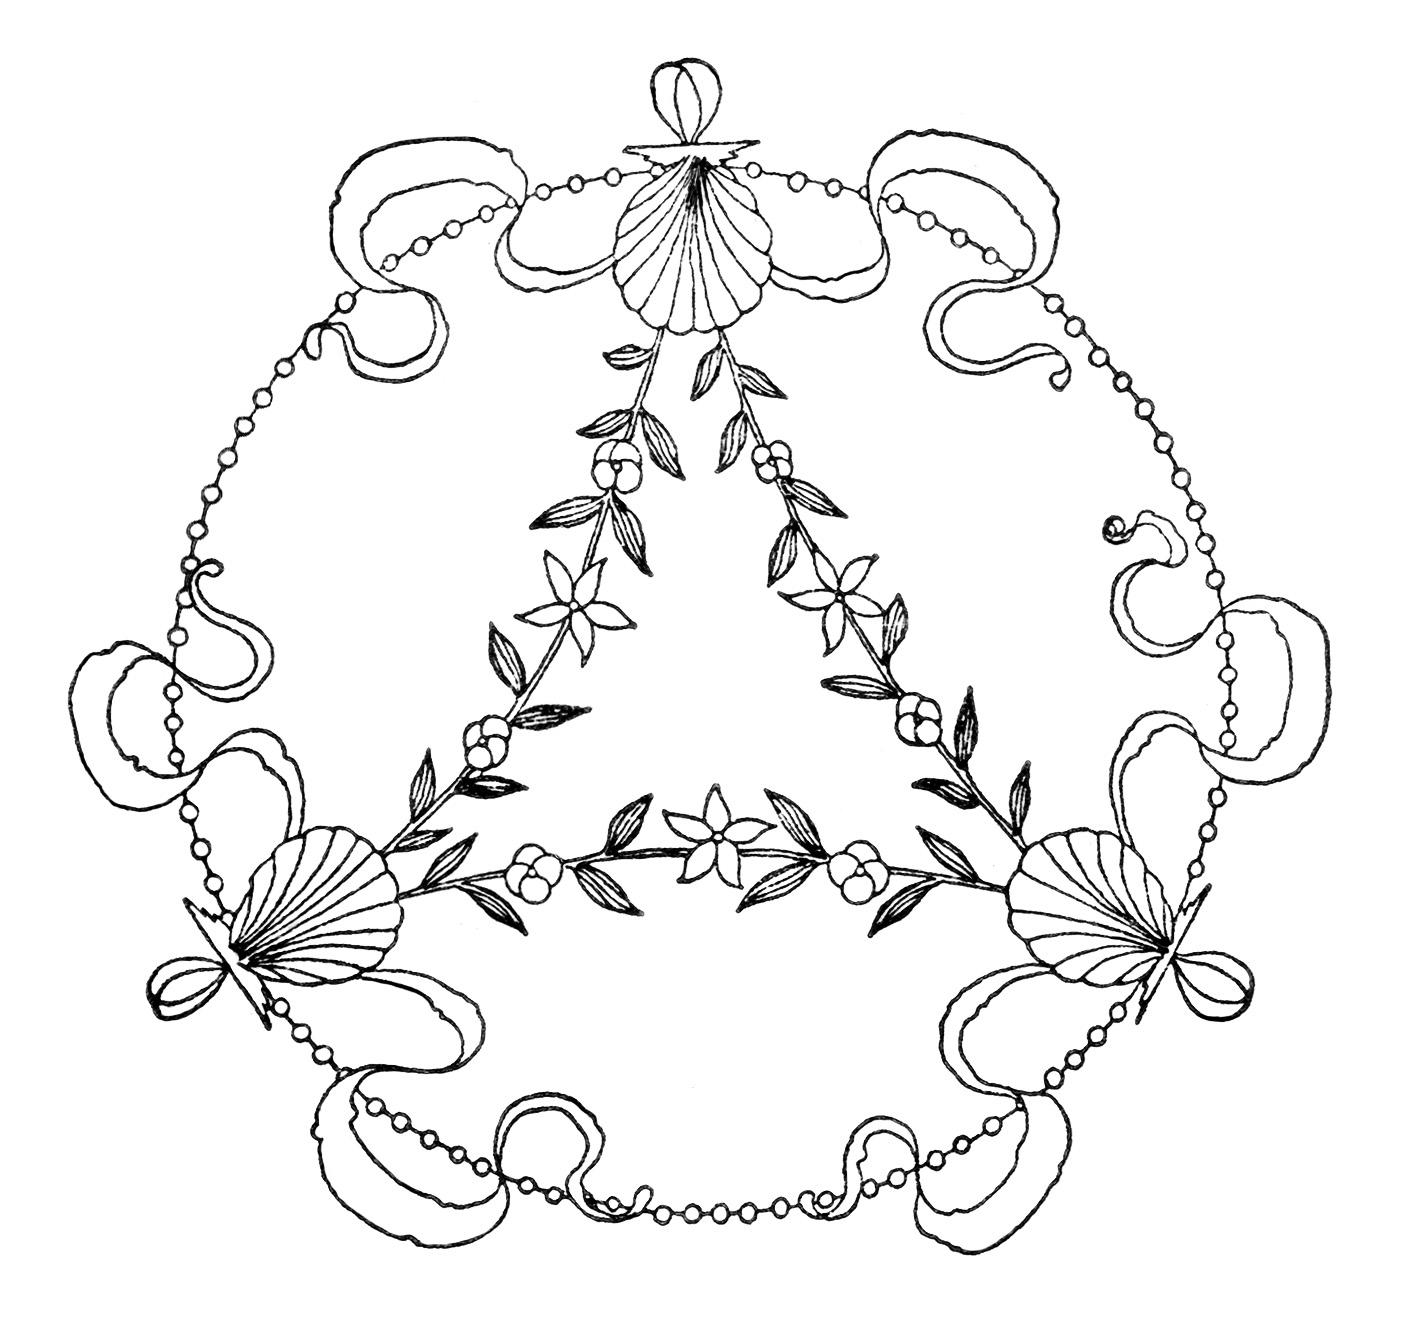 Free Clipart Vintage Embroidery Designs Old Design Shop Blog